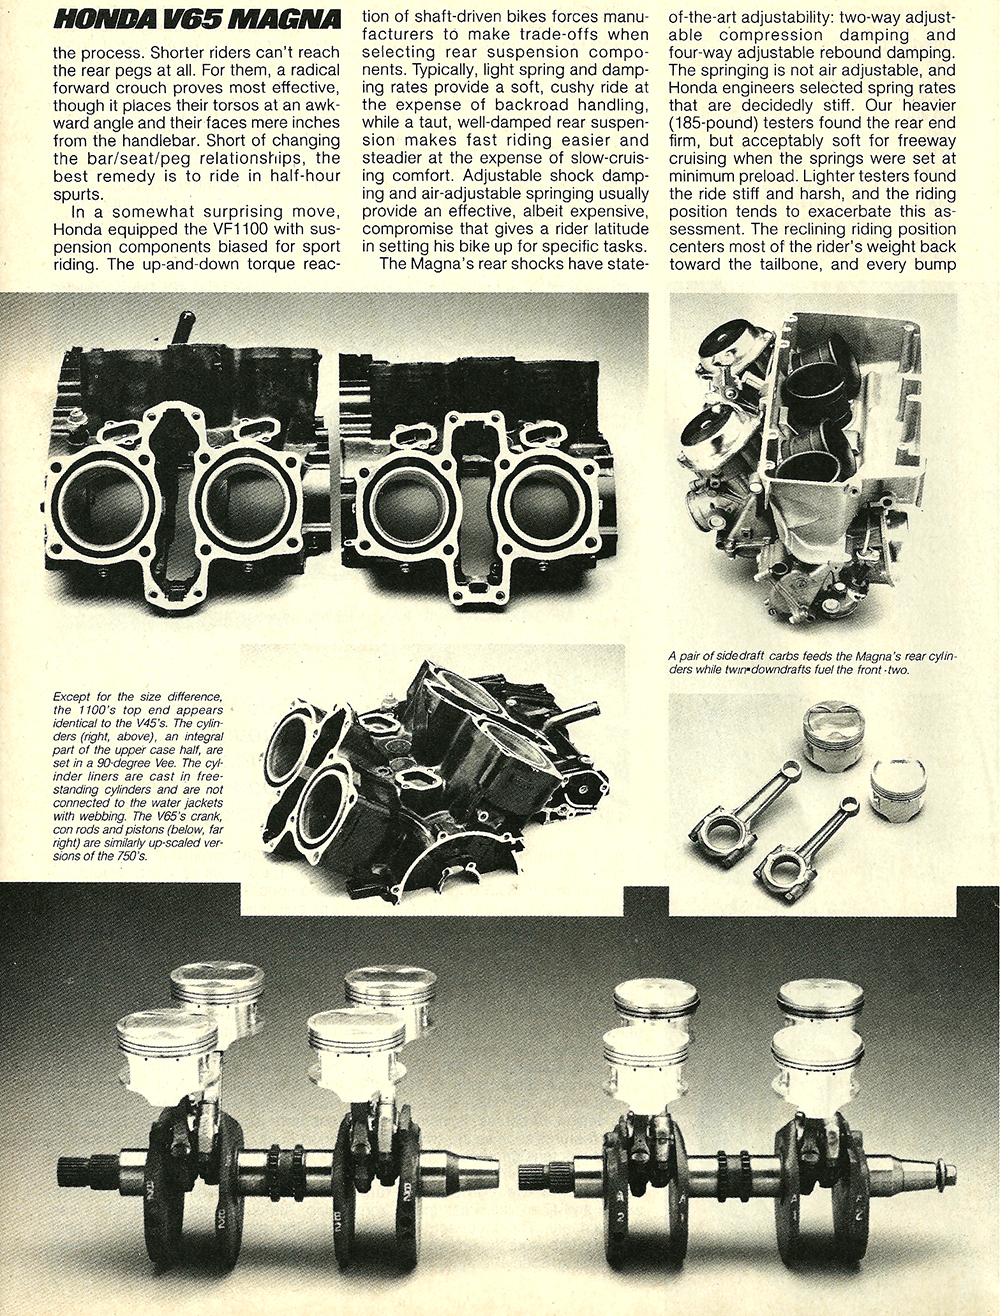 1983 Honda V65 Magna road test 5.jpg